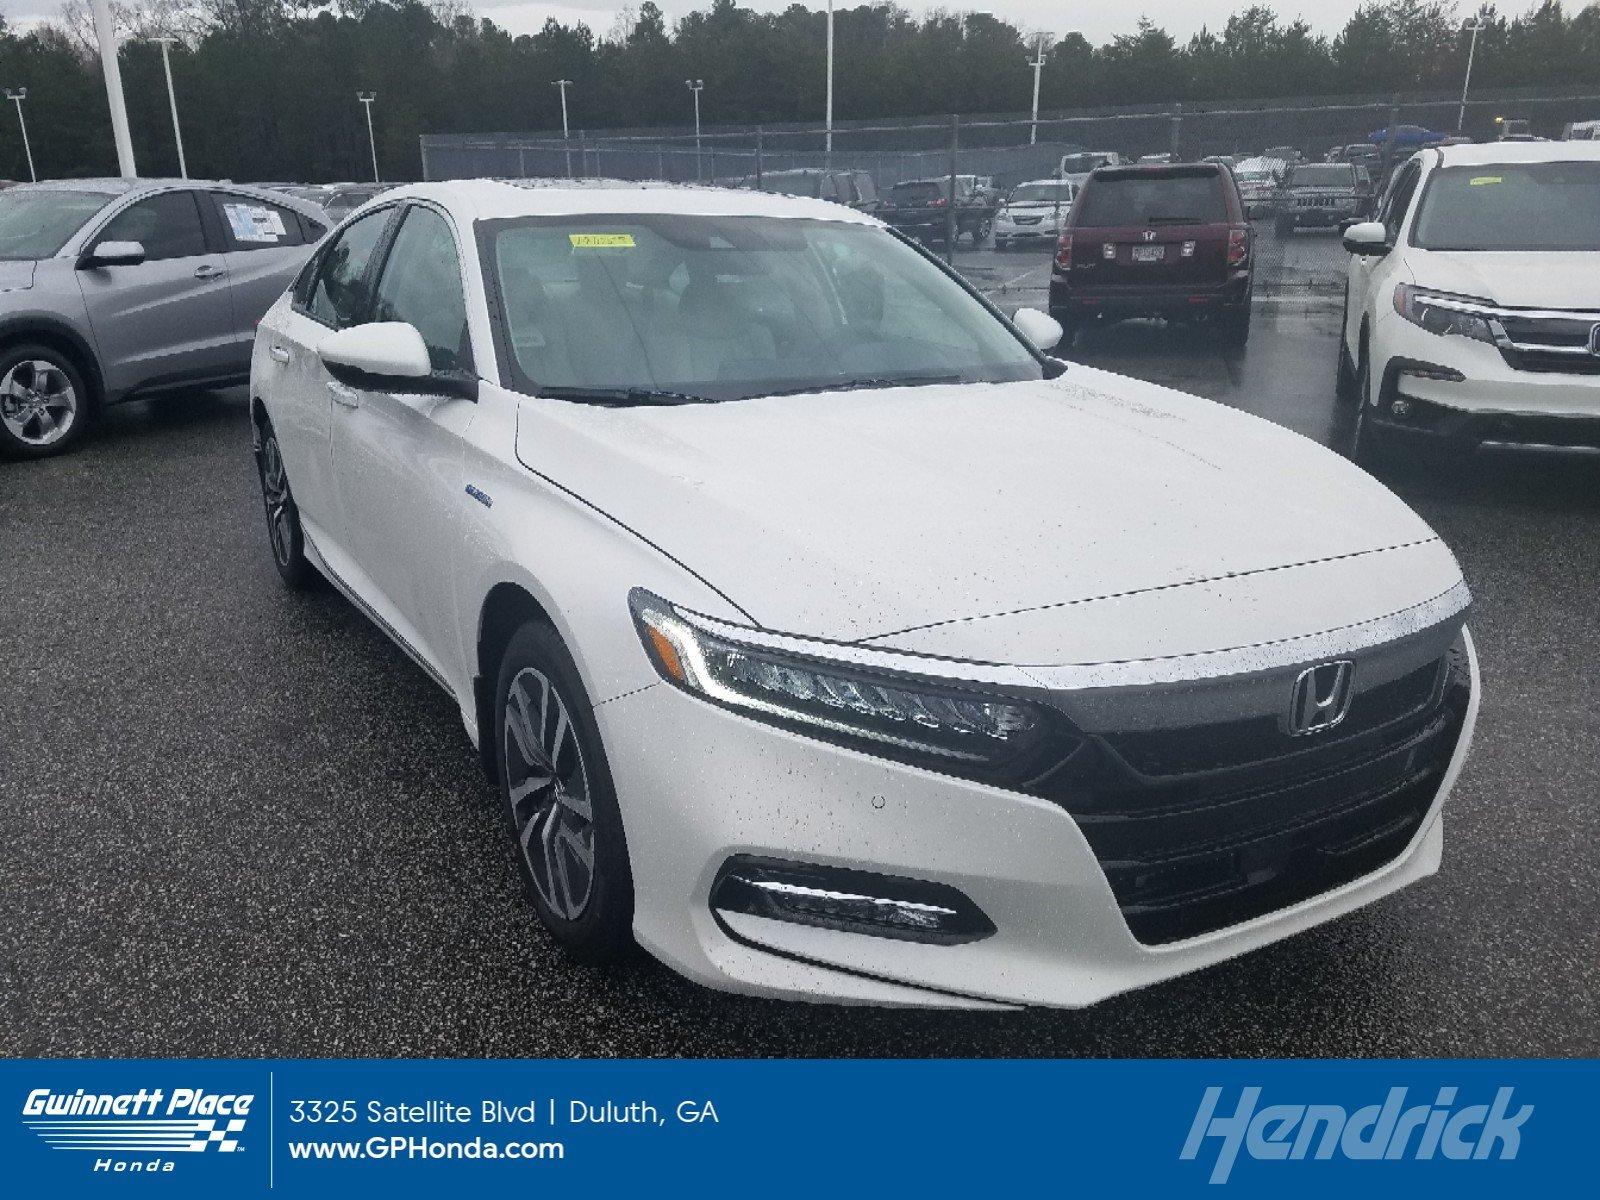 New 2019 Honda Accord Hybrid Touring Sedan Sedan for sale in Durham, NC